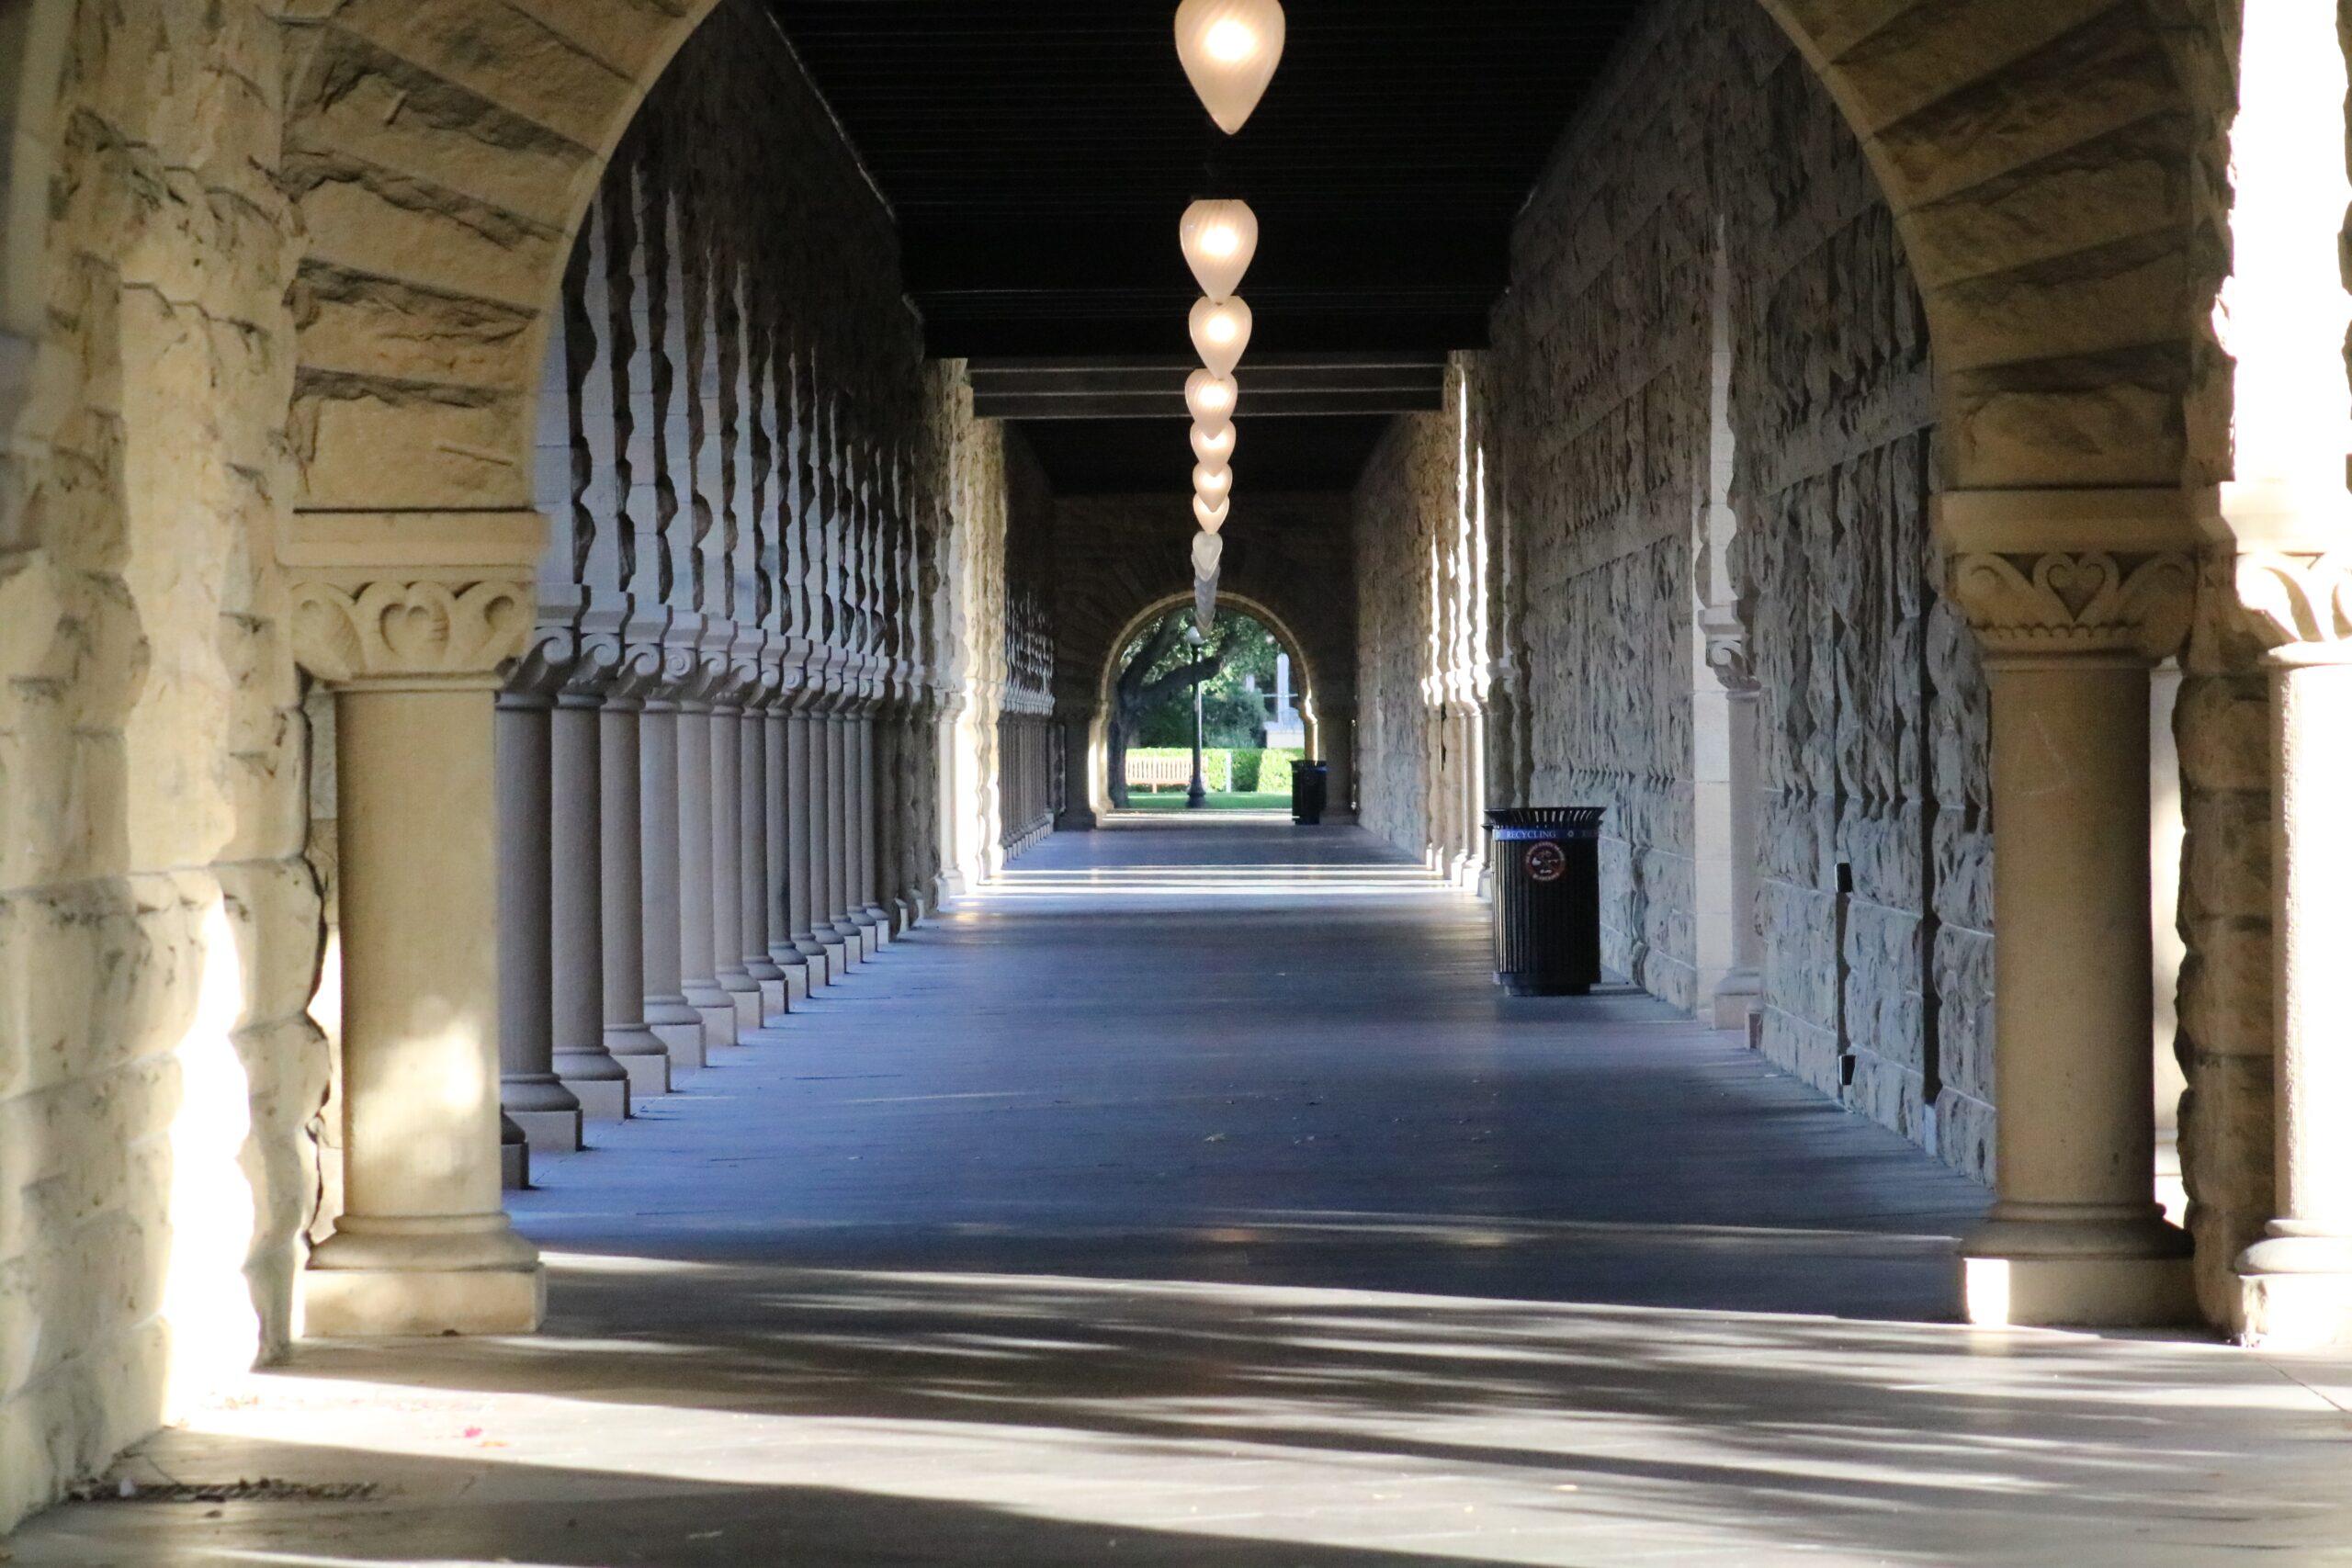 jorge-fernandez-salas-Stanford Arches early eve-unsplash